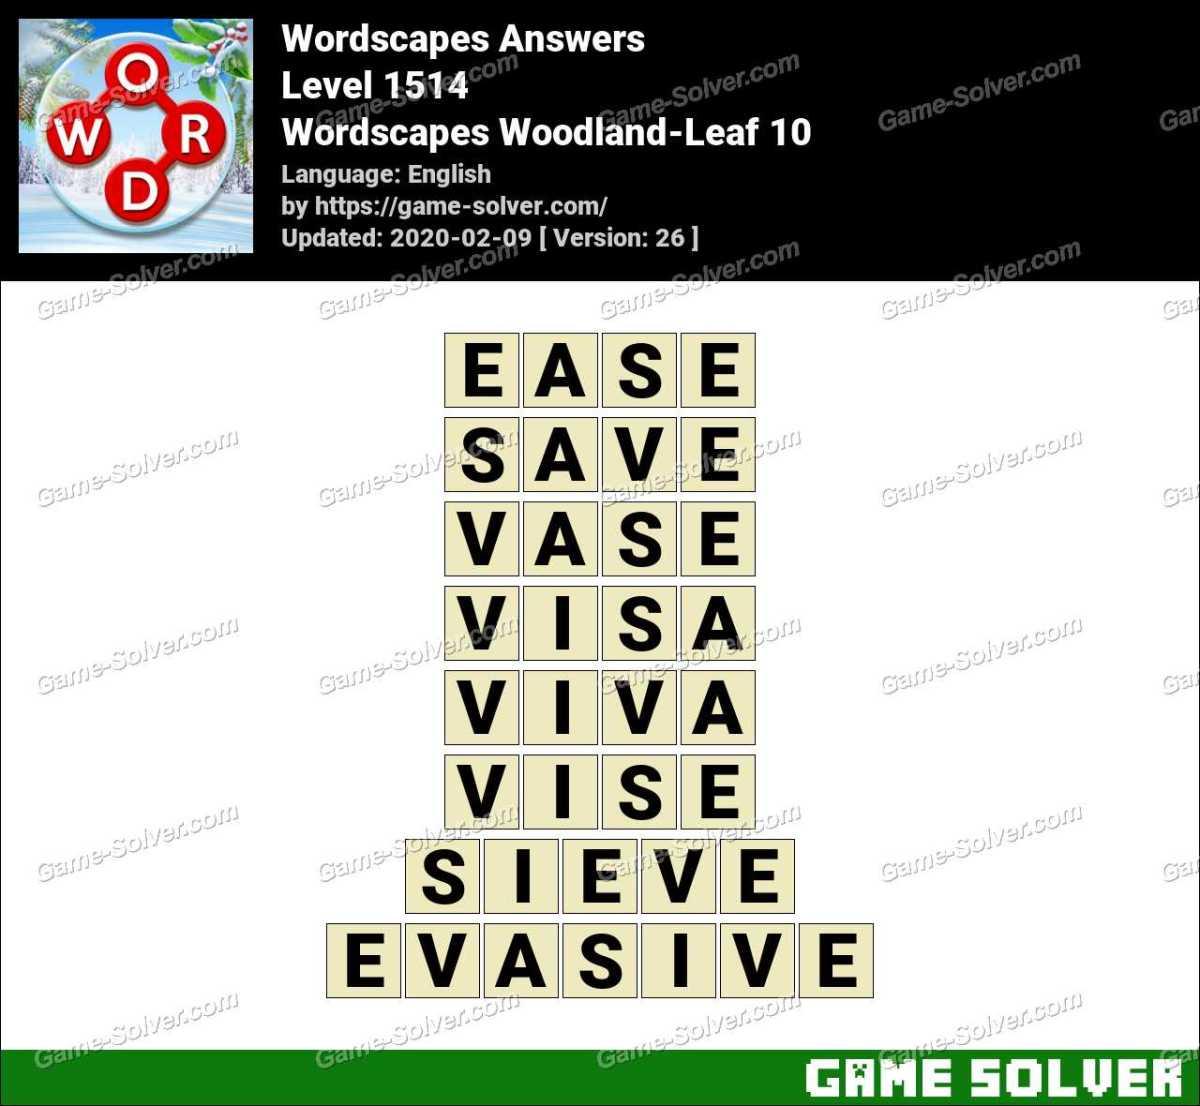 Wordscapes Woodland-Leaf 10 Answers